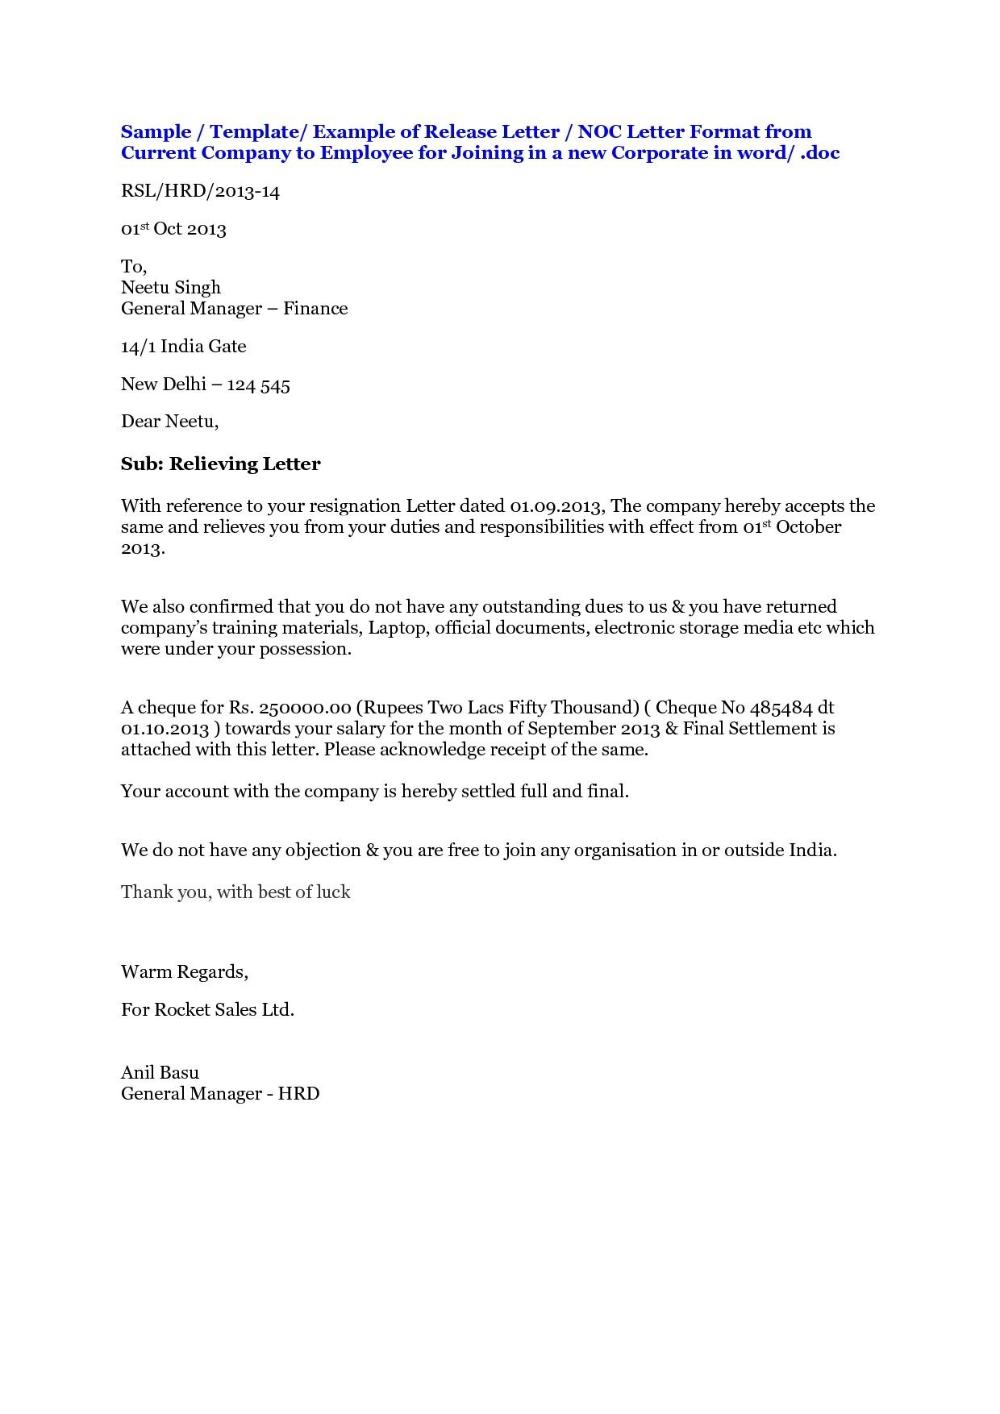 No Objection Letter Format For Employer Shopgrat Krishna Kanta Bag